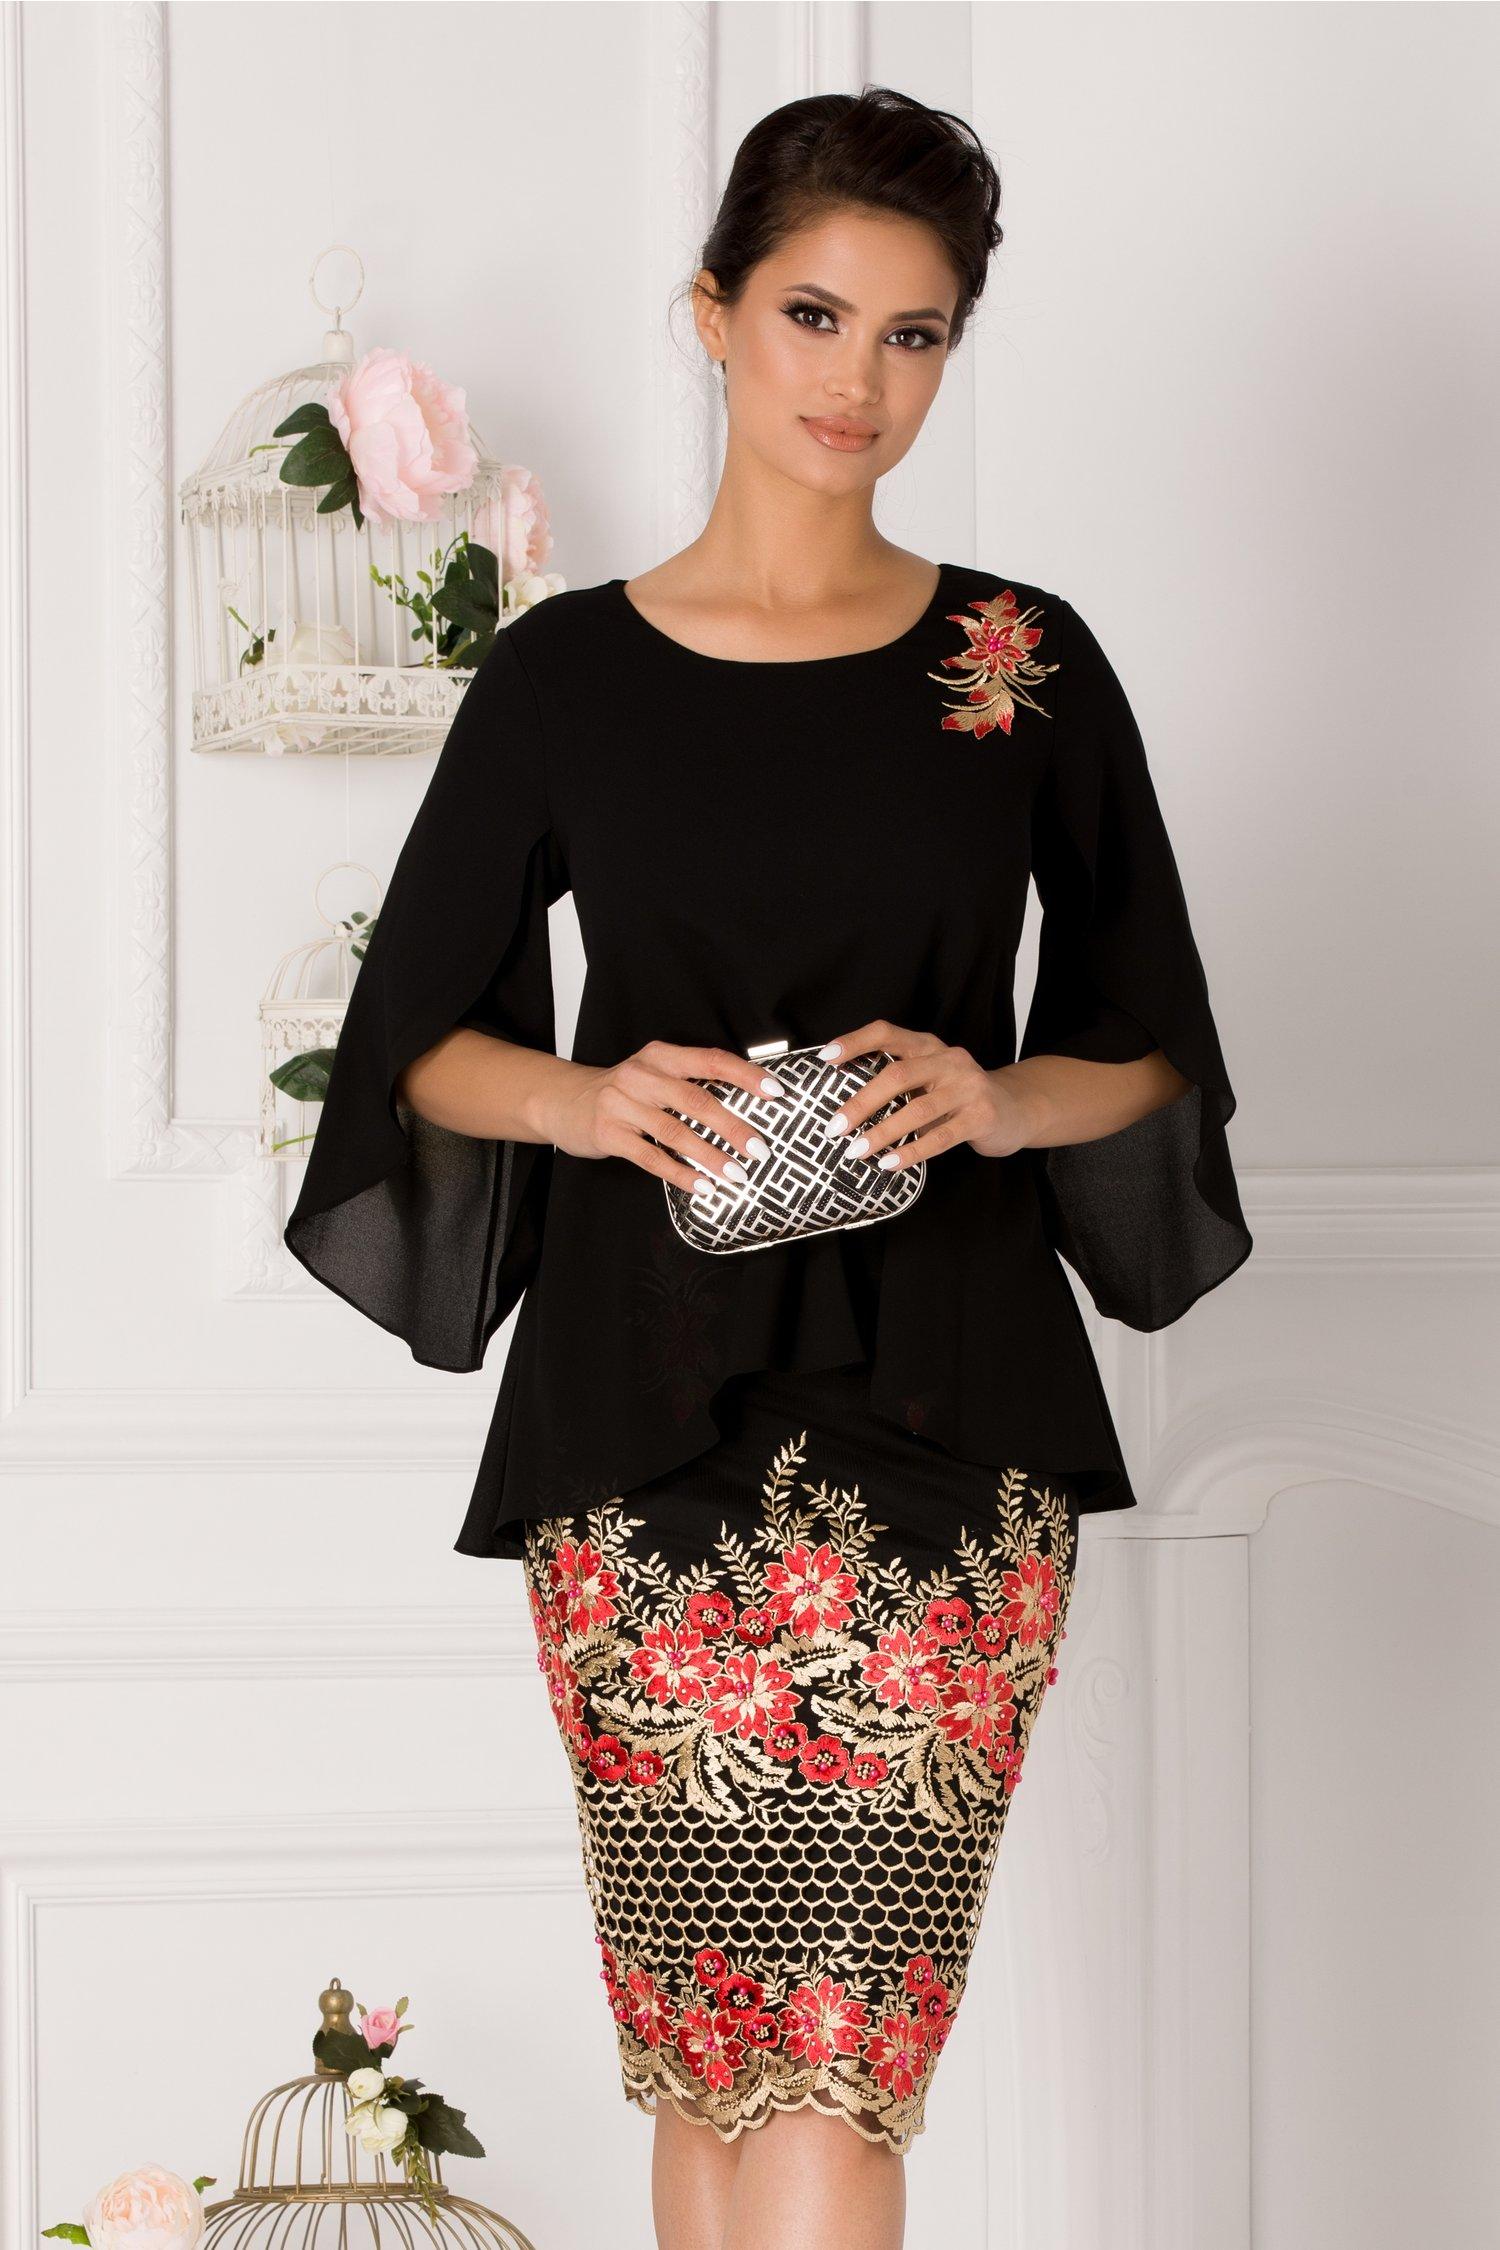 Rochie Ramyra neagra cu broderie florala rosie